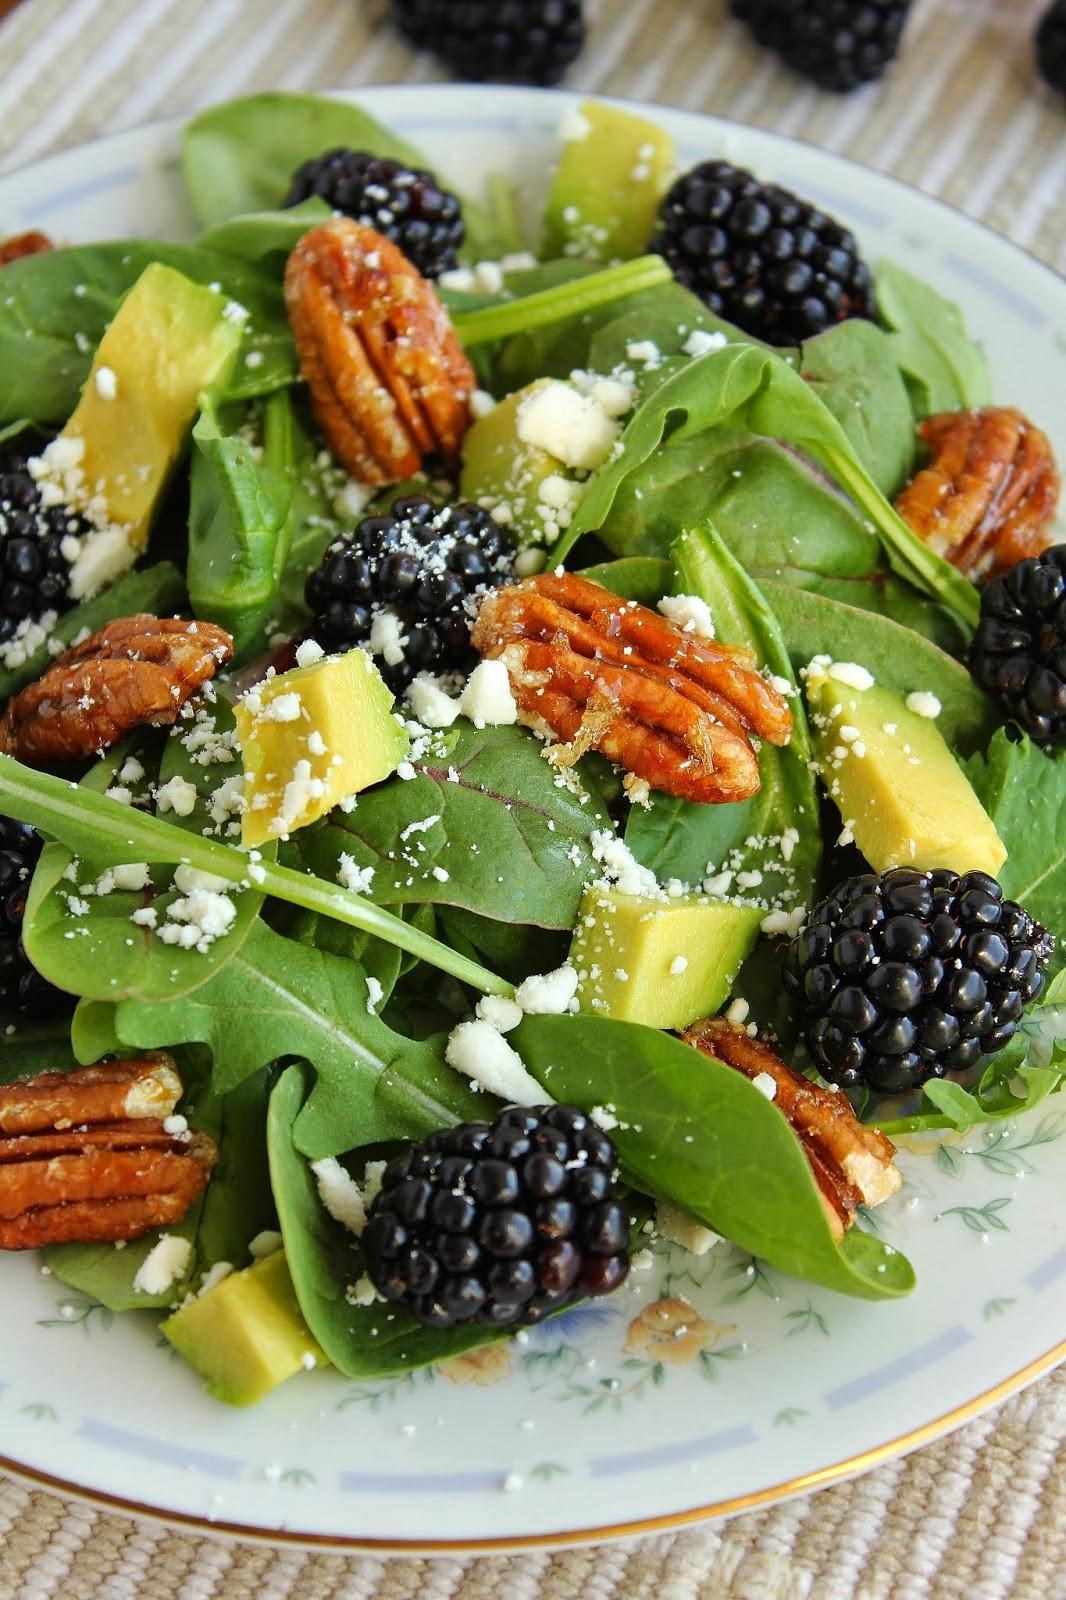 Tart Green Salad With Avocado Dressing